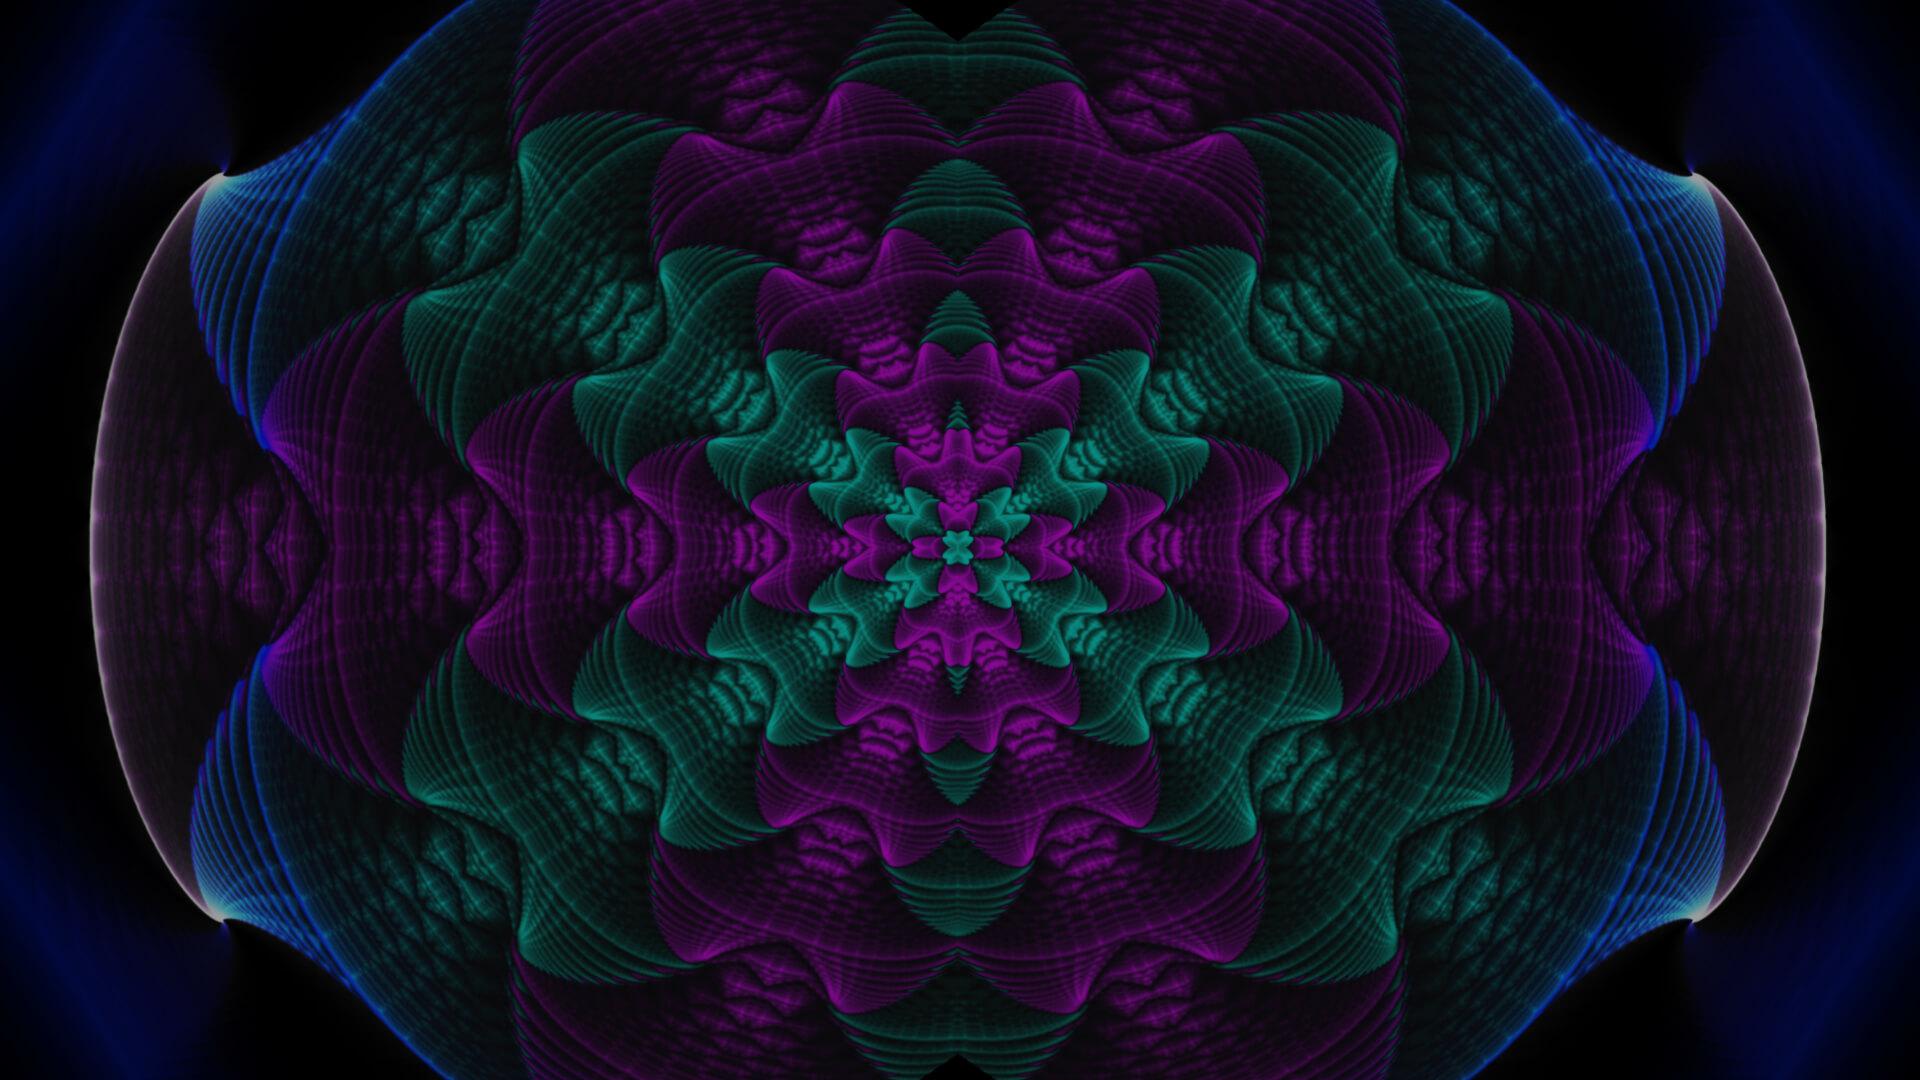 Velvet jewel - digital abstract art by Mitek